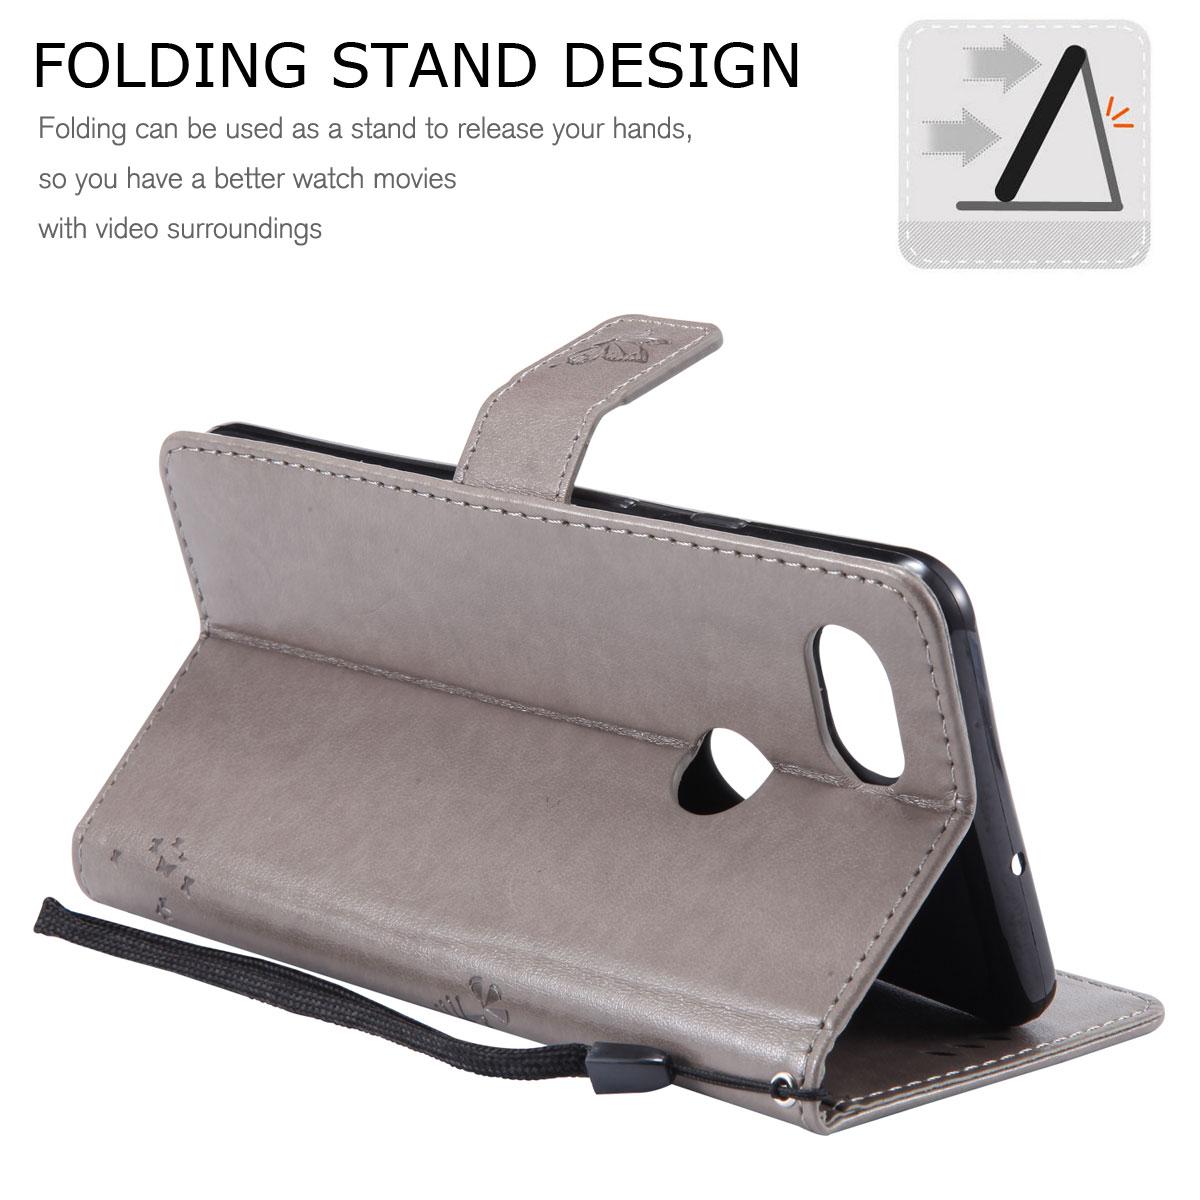 Magnetic-Leather-Credit-Card-Holder-Flip-Case-Cover-For-Google-Pixel-2-2-XL thumbnail 36